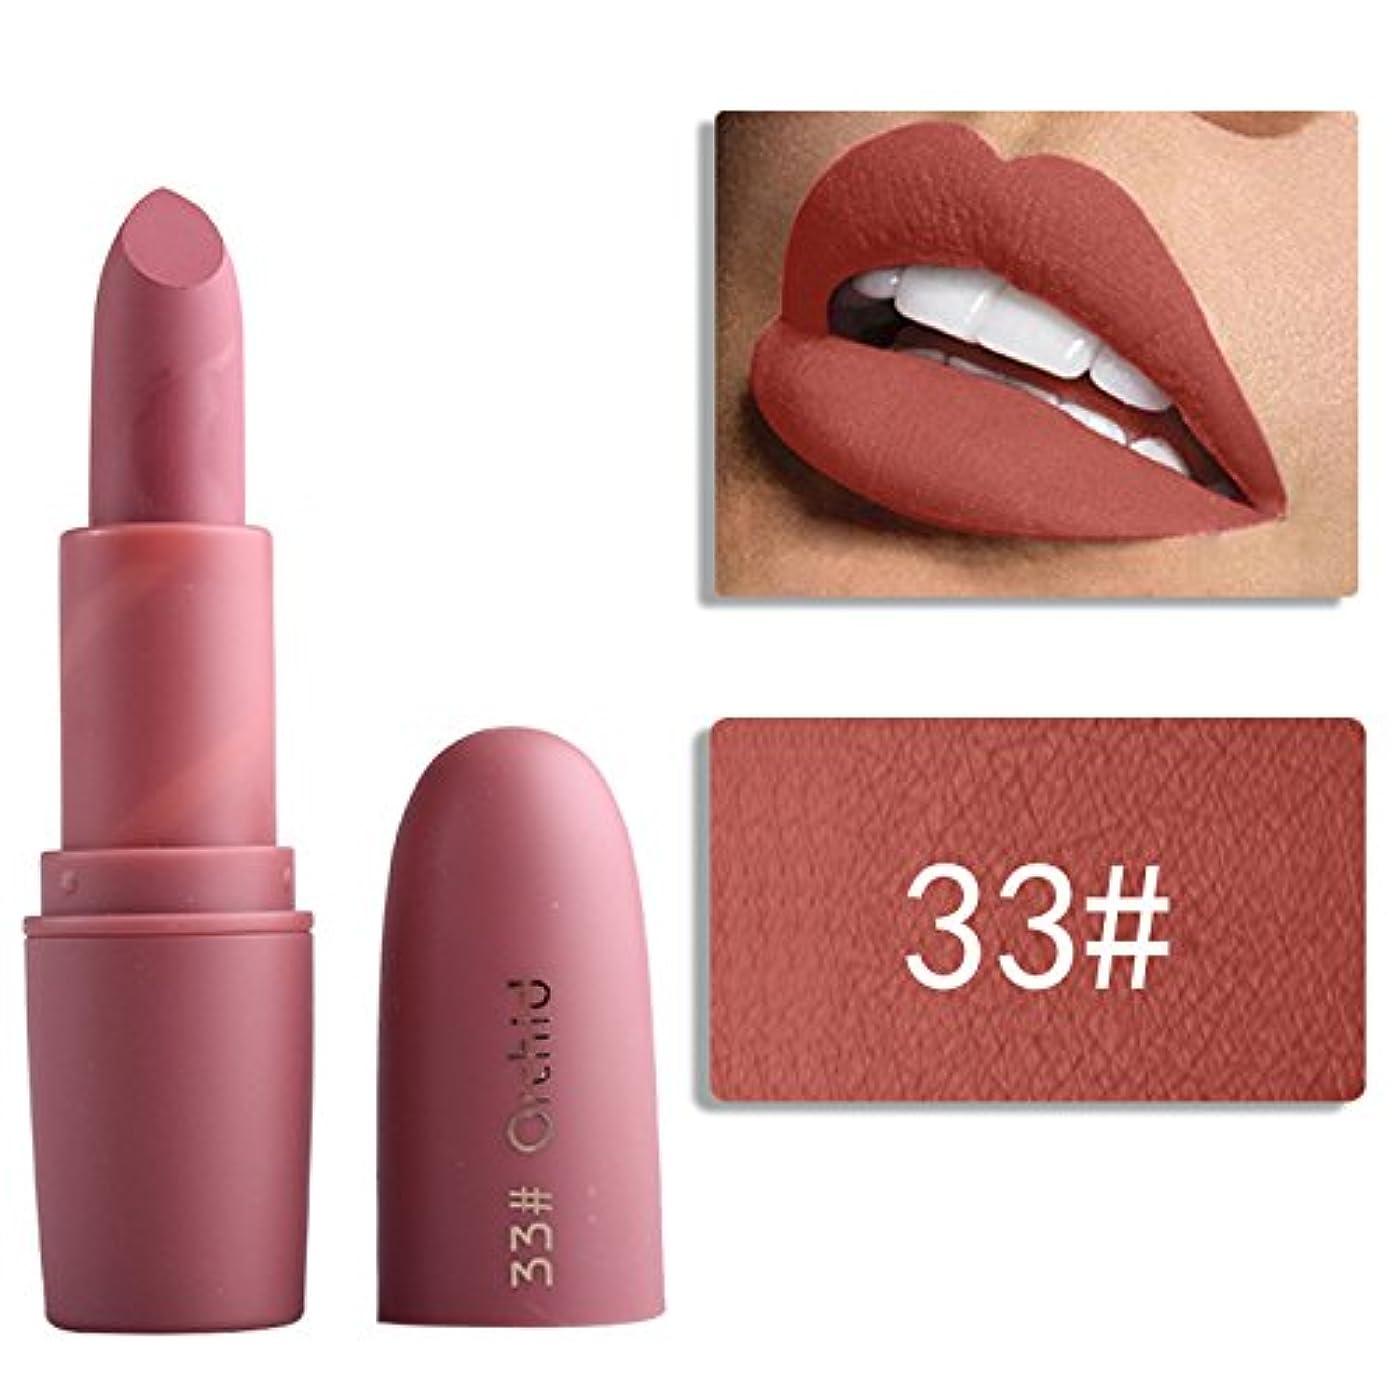 Miss Rose Nude Lipstick 22 colors Waterproof Vampire Brown Beauty Baby Lips Batom Matte lipstick Makeup Tats Eugenie...